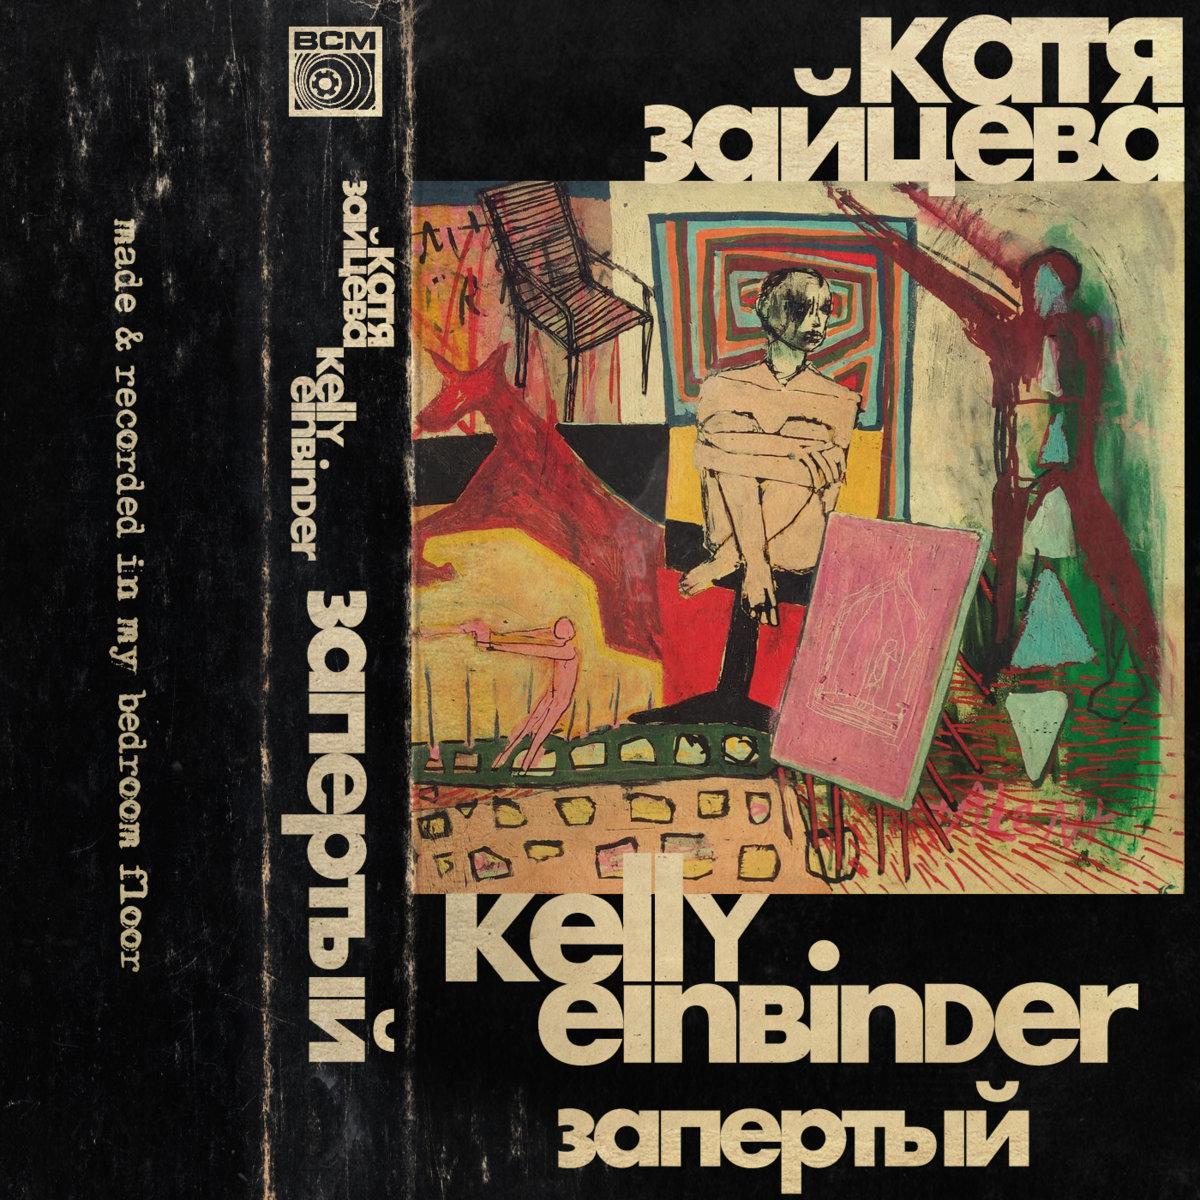 Kompakt Kat (Featuring Kelly Einbinder)